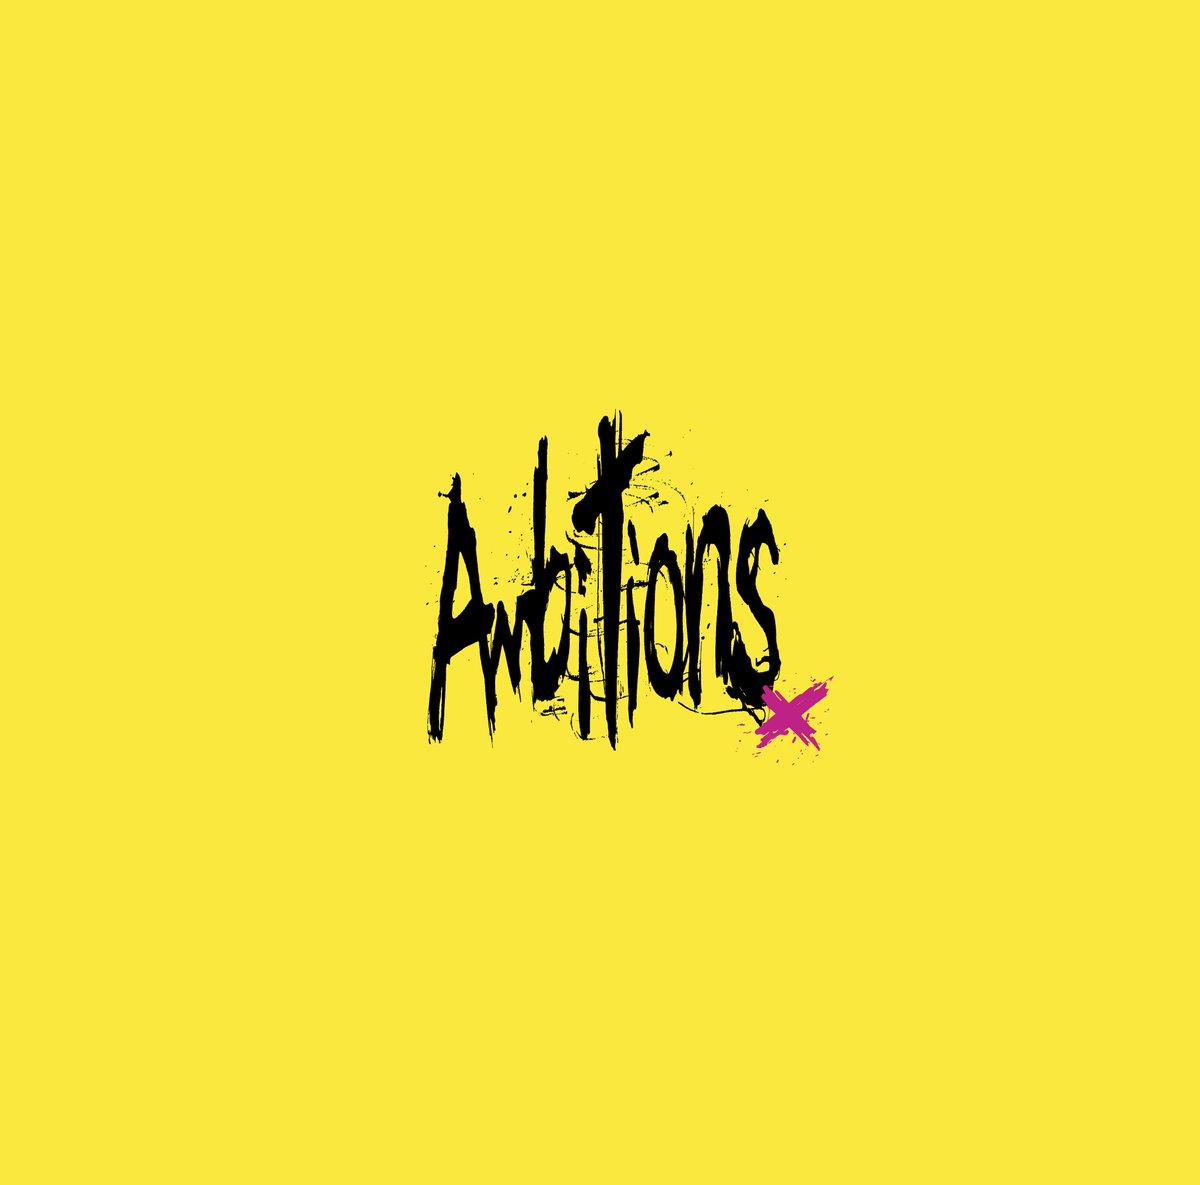 ONE OK ROCK、2年ぶりにニューアルバム「Ambitions」のリリースが2017年1月11日に決定!!プレオーダー開始! https://t.co/Om6Q4kRGCn